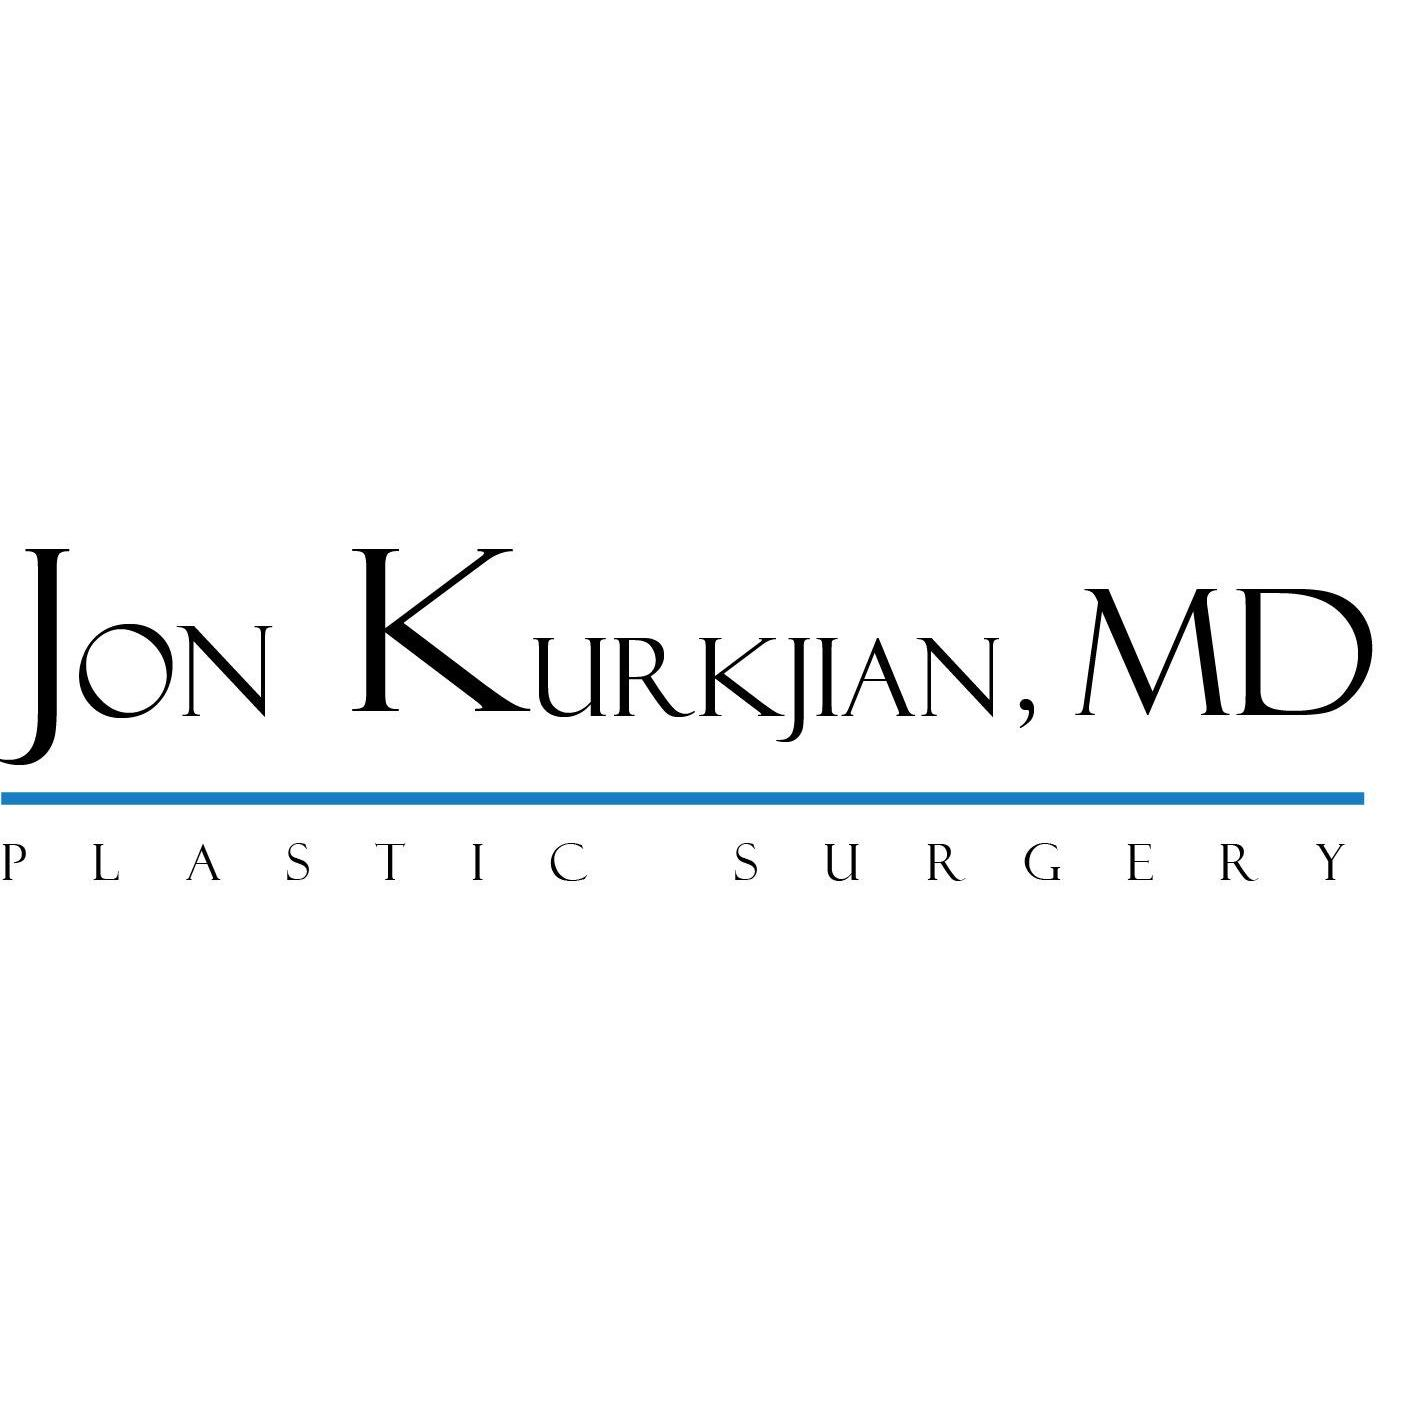 Jon Kurkjian, M.D.